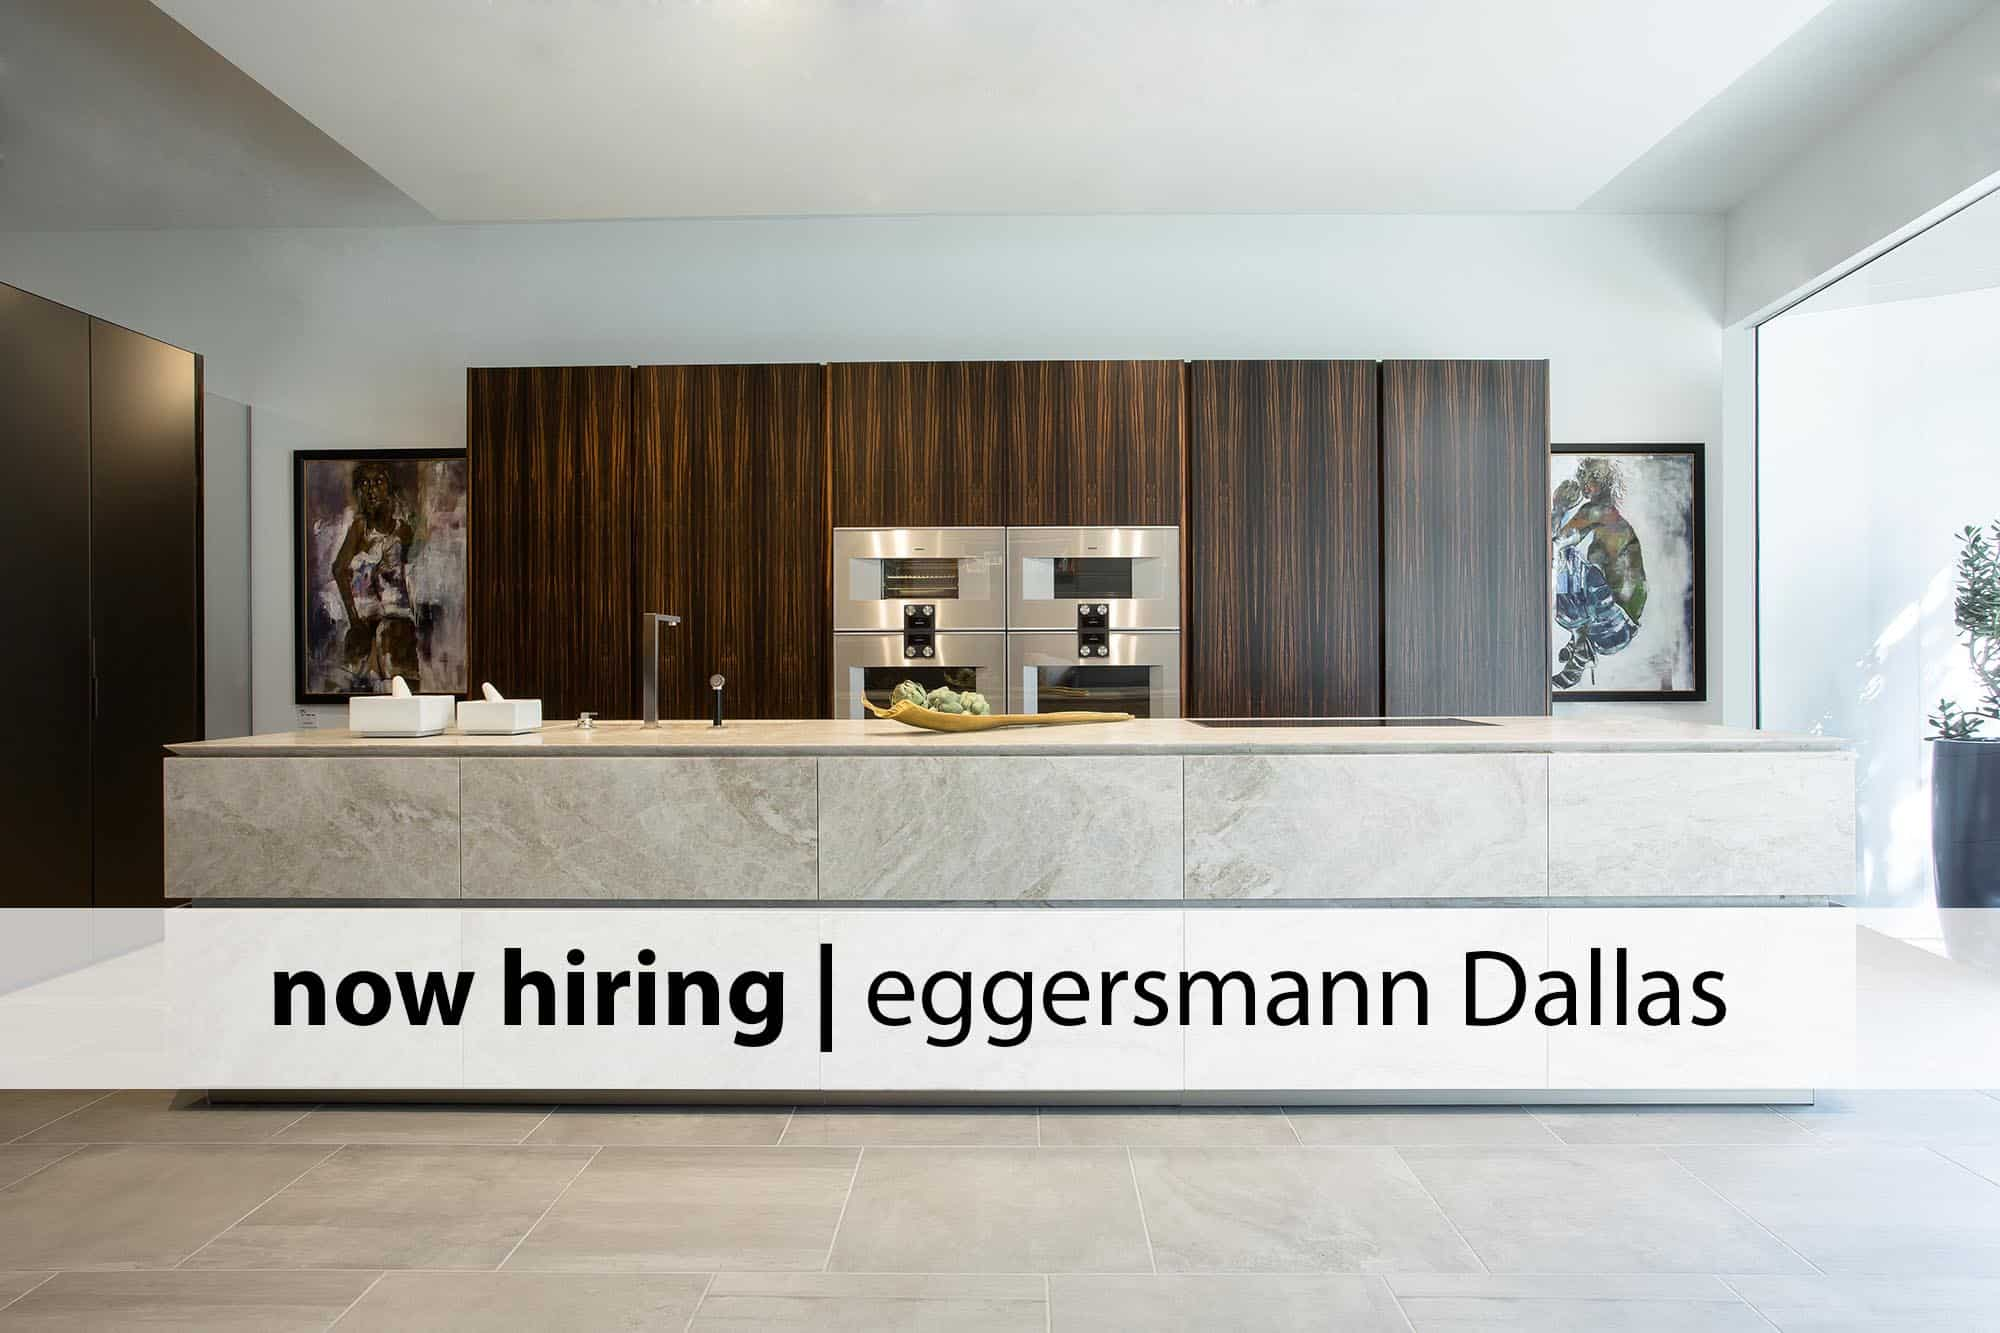 Showroom manager kitchen design sales eggersmann usa dallas 18 jun showroom manager eggersmann dallas malvernweather Images